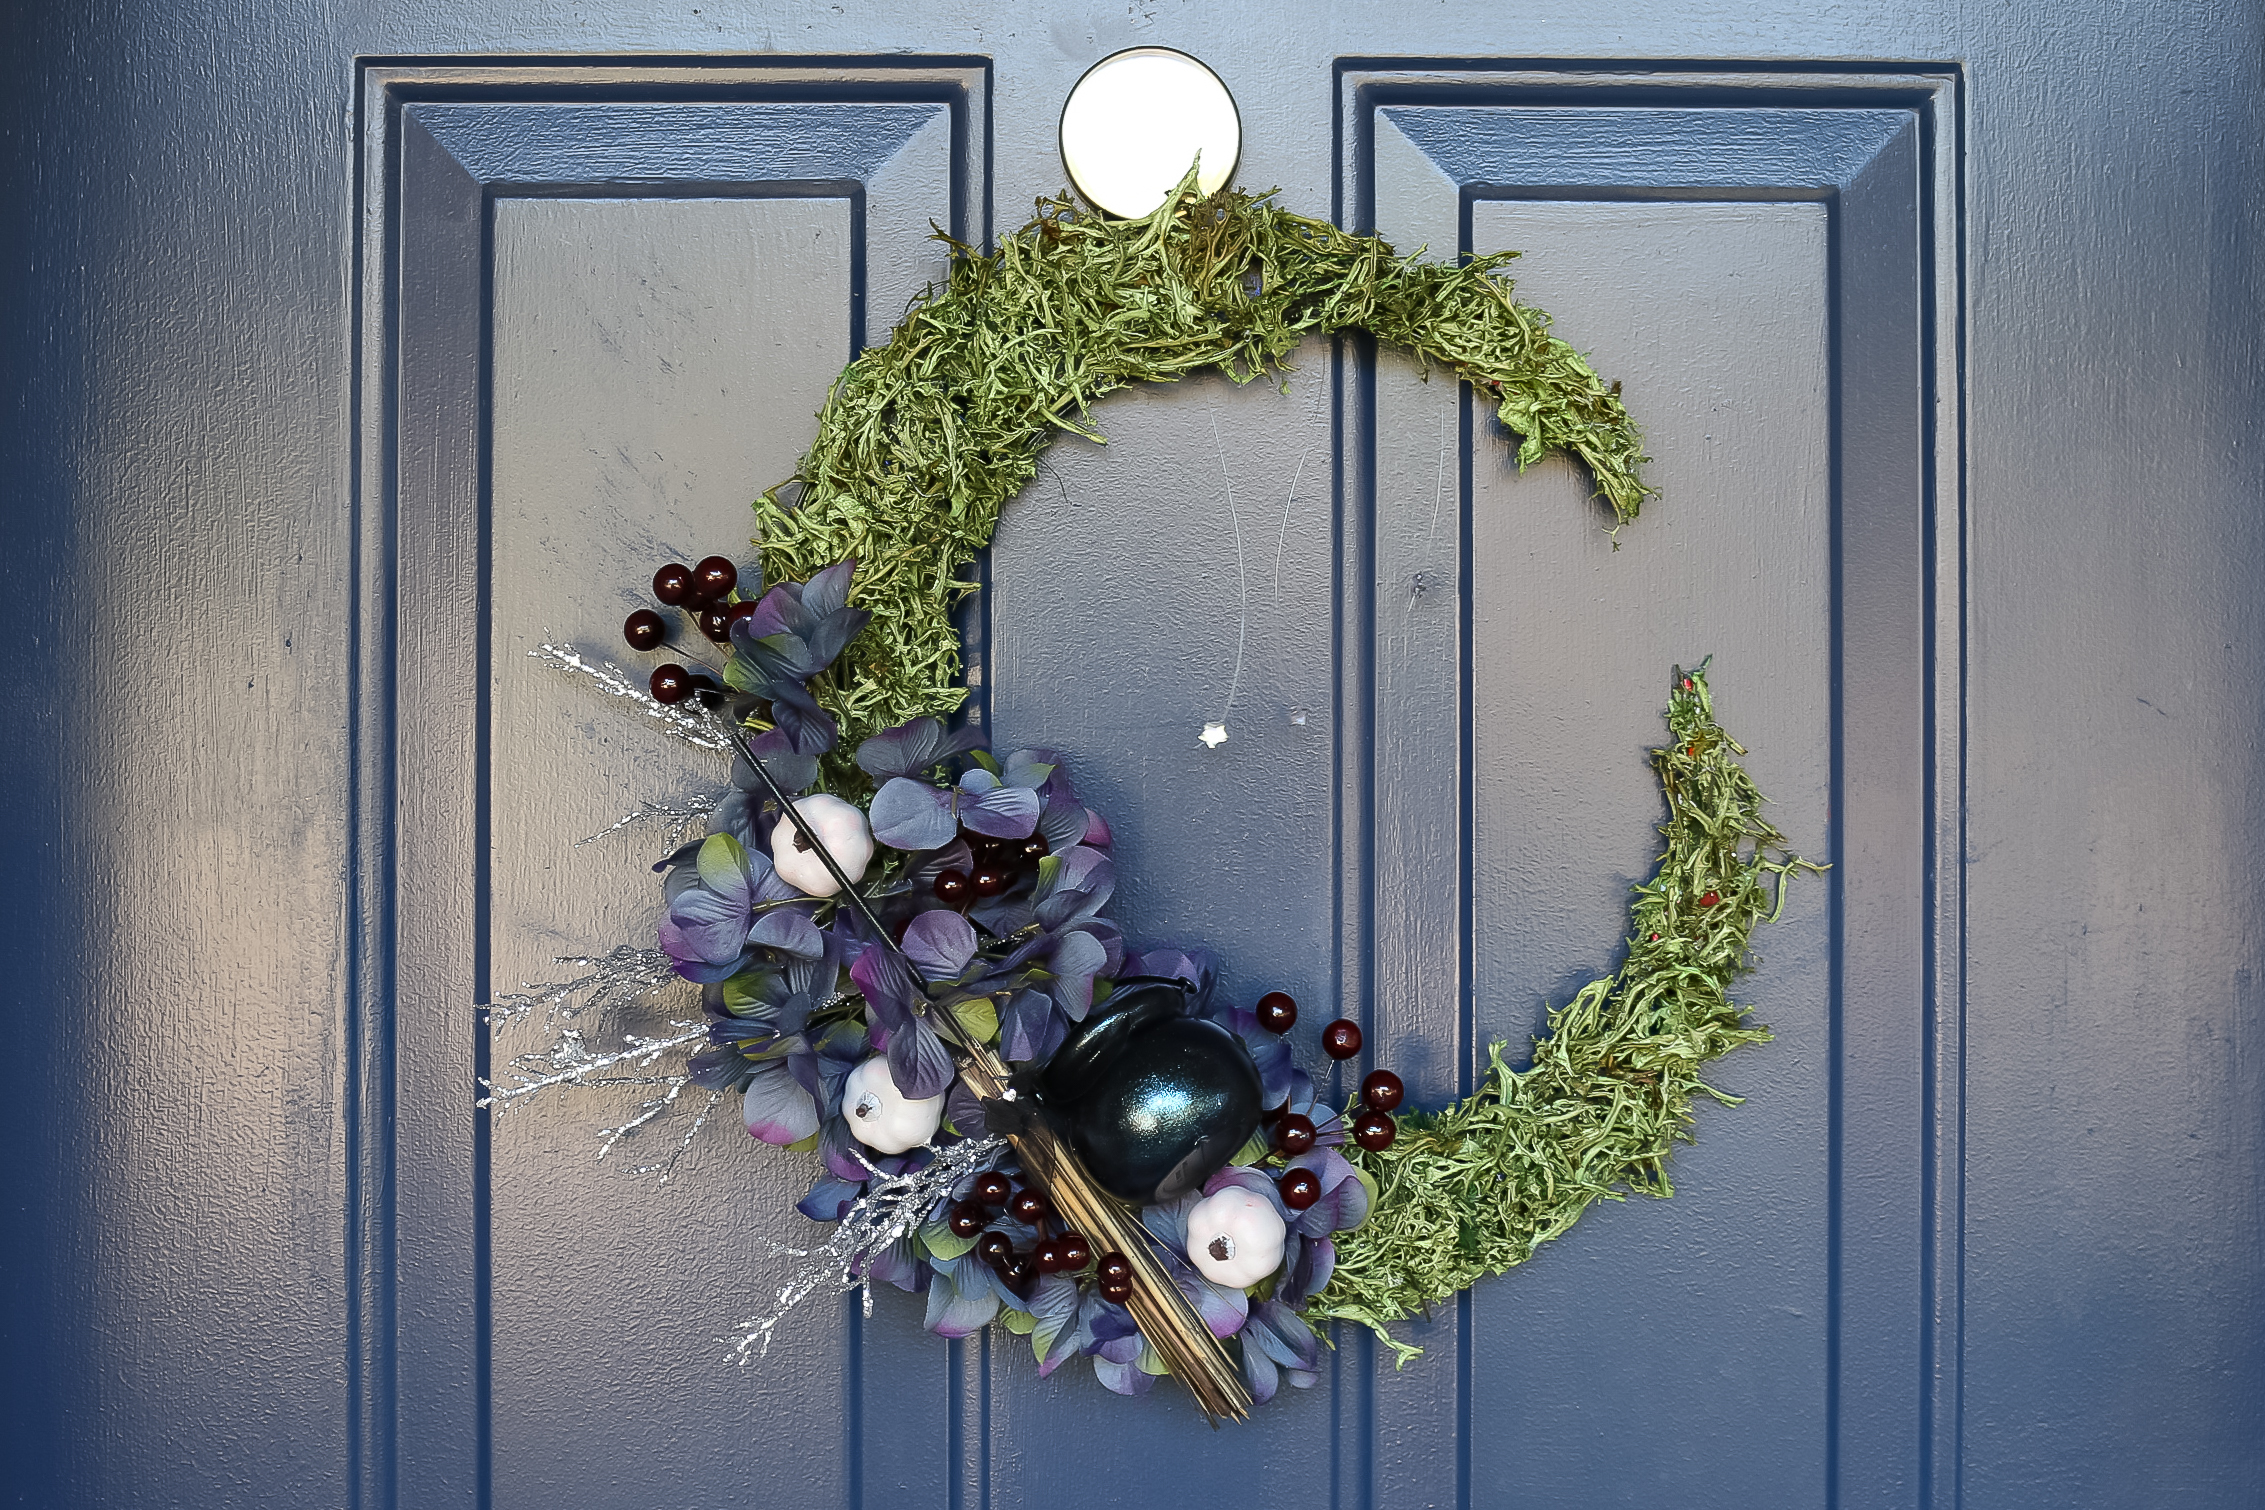 floral crescent moon wreath on a blue door